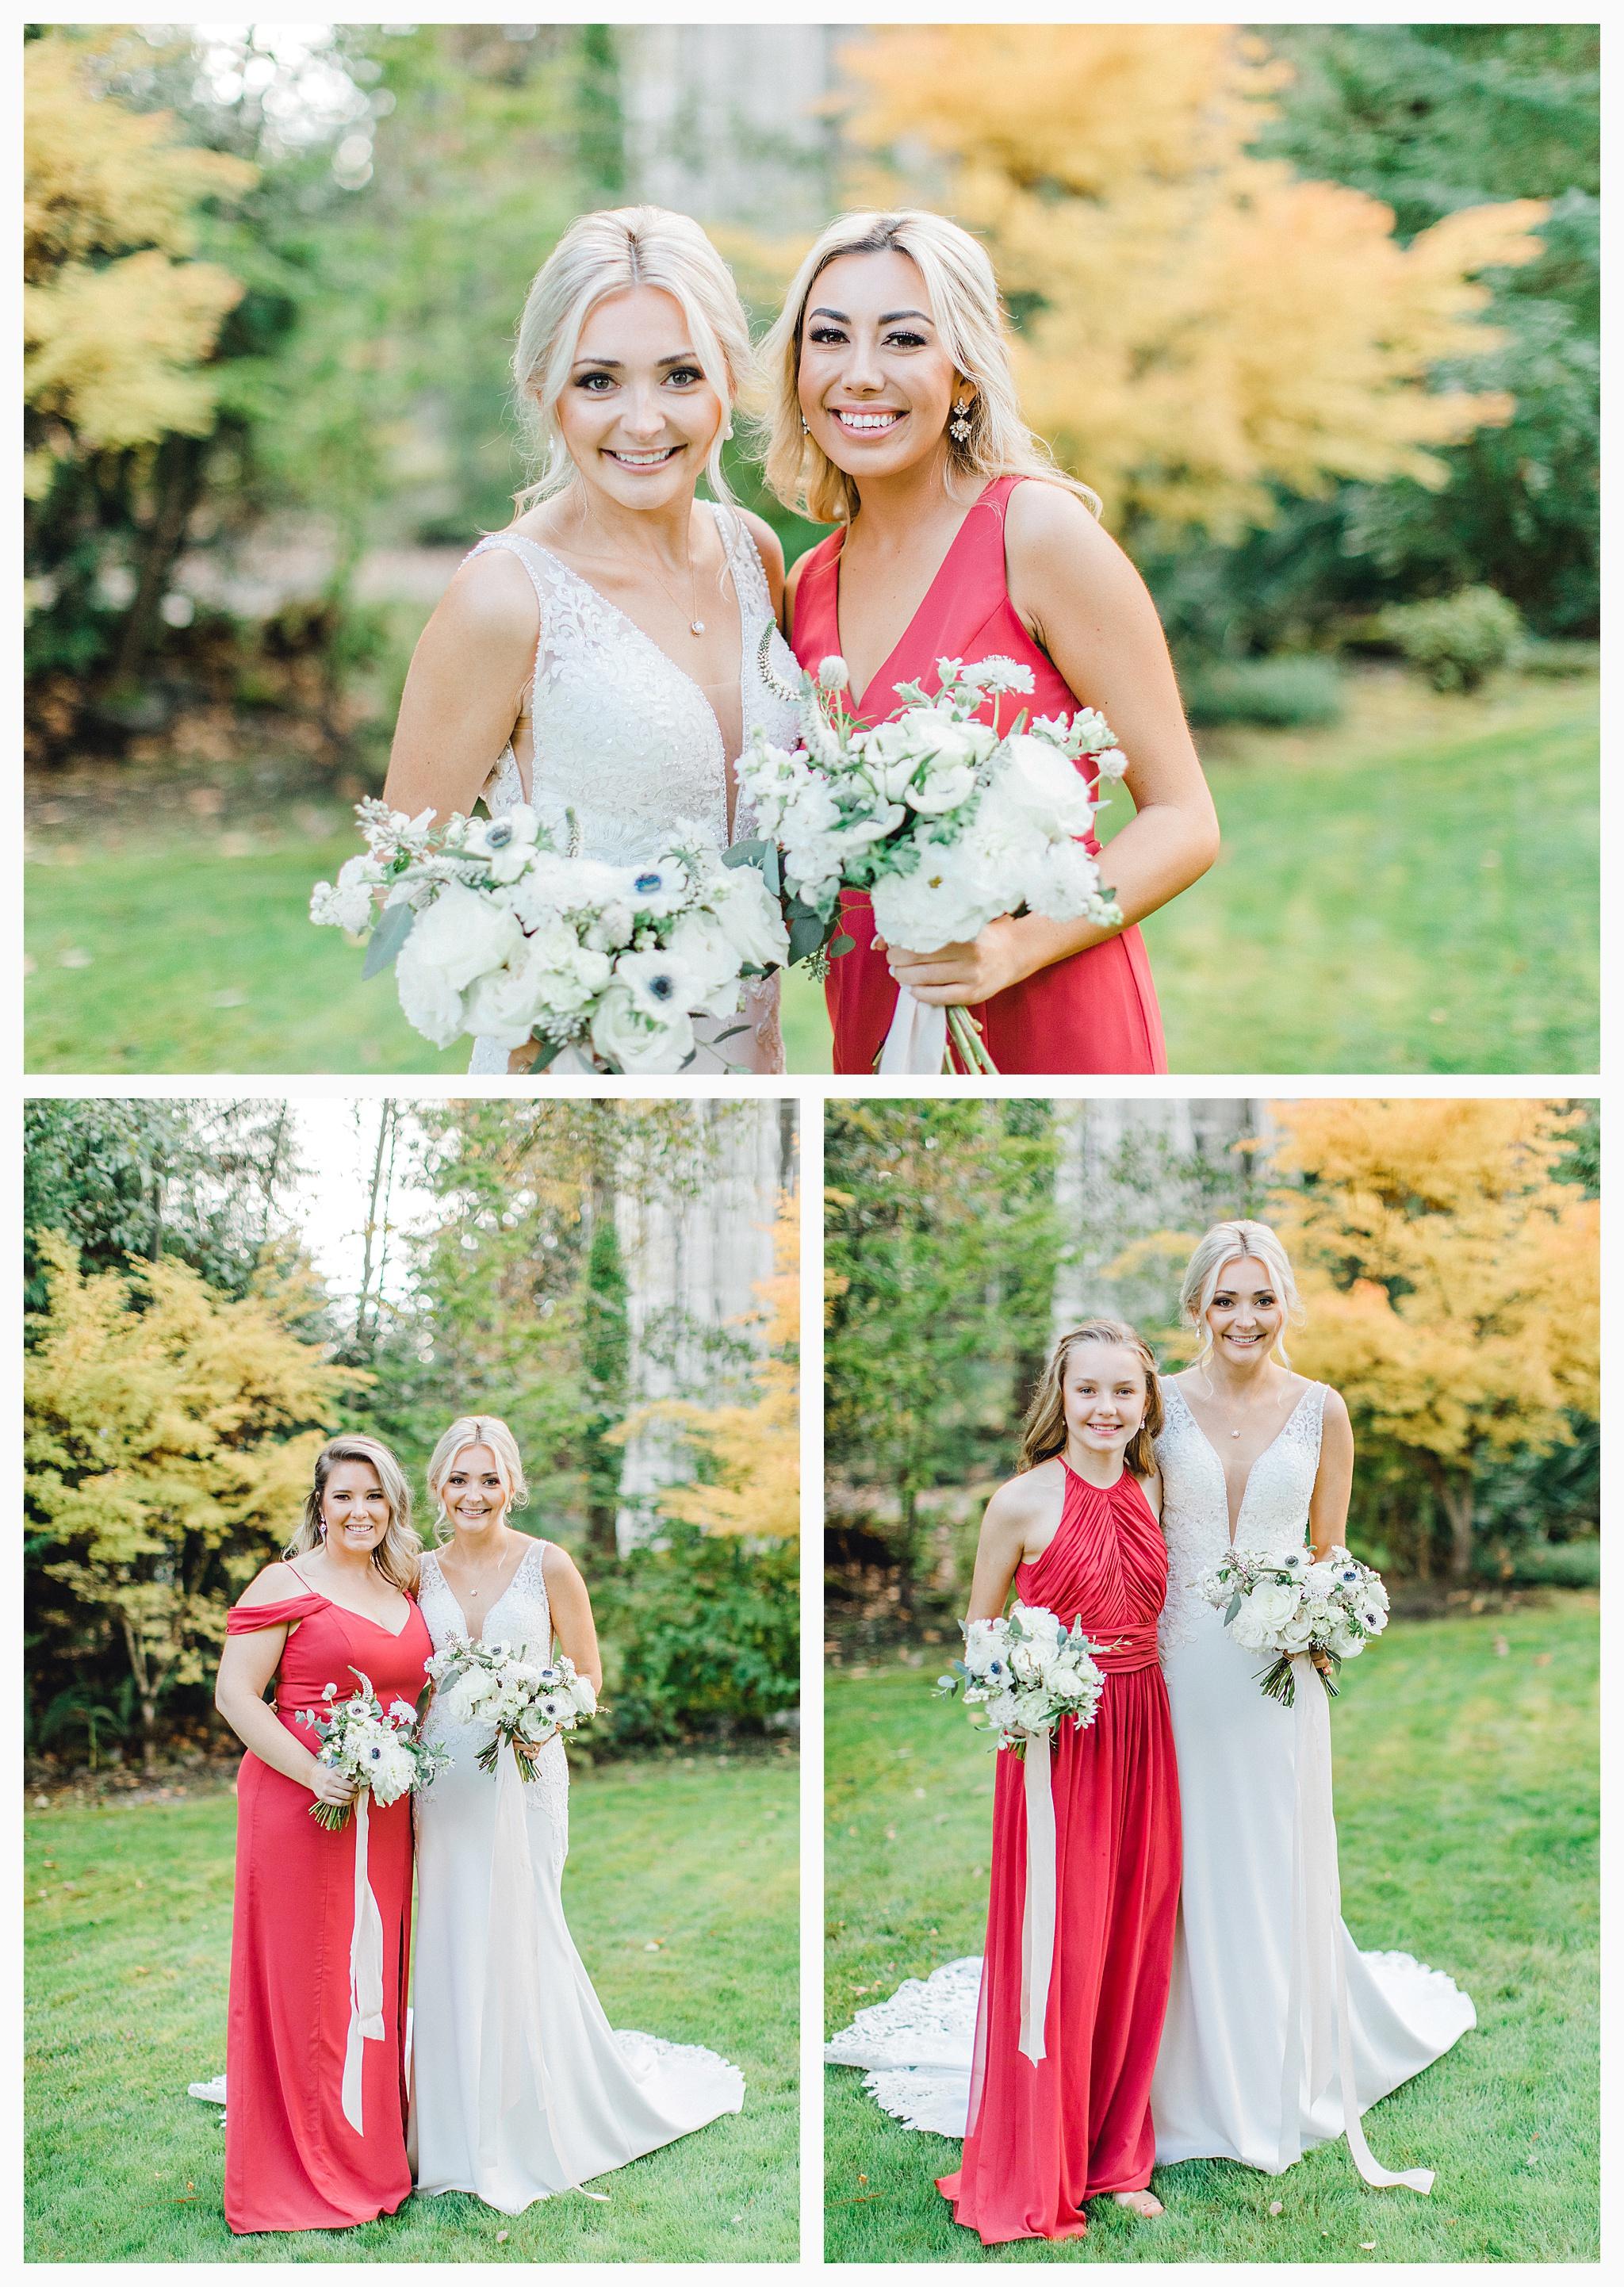 Emma Rose Company Light and Airy Wedding Photographer, Beautiful fall wedding at Rock Creek Gardens Venue in Puyallup, Washington._0041.jpg